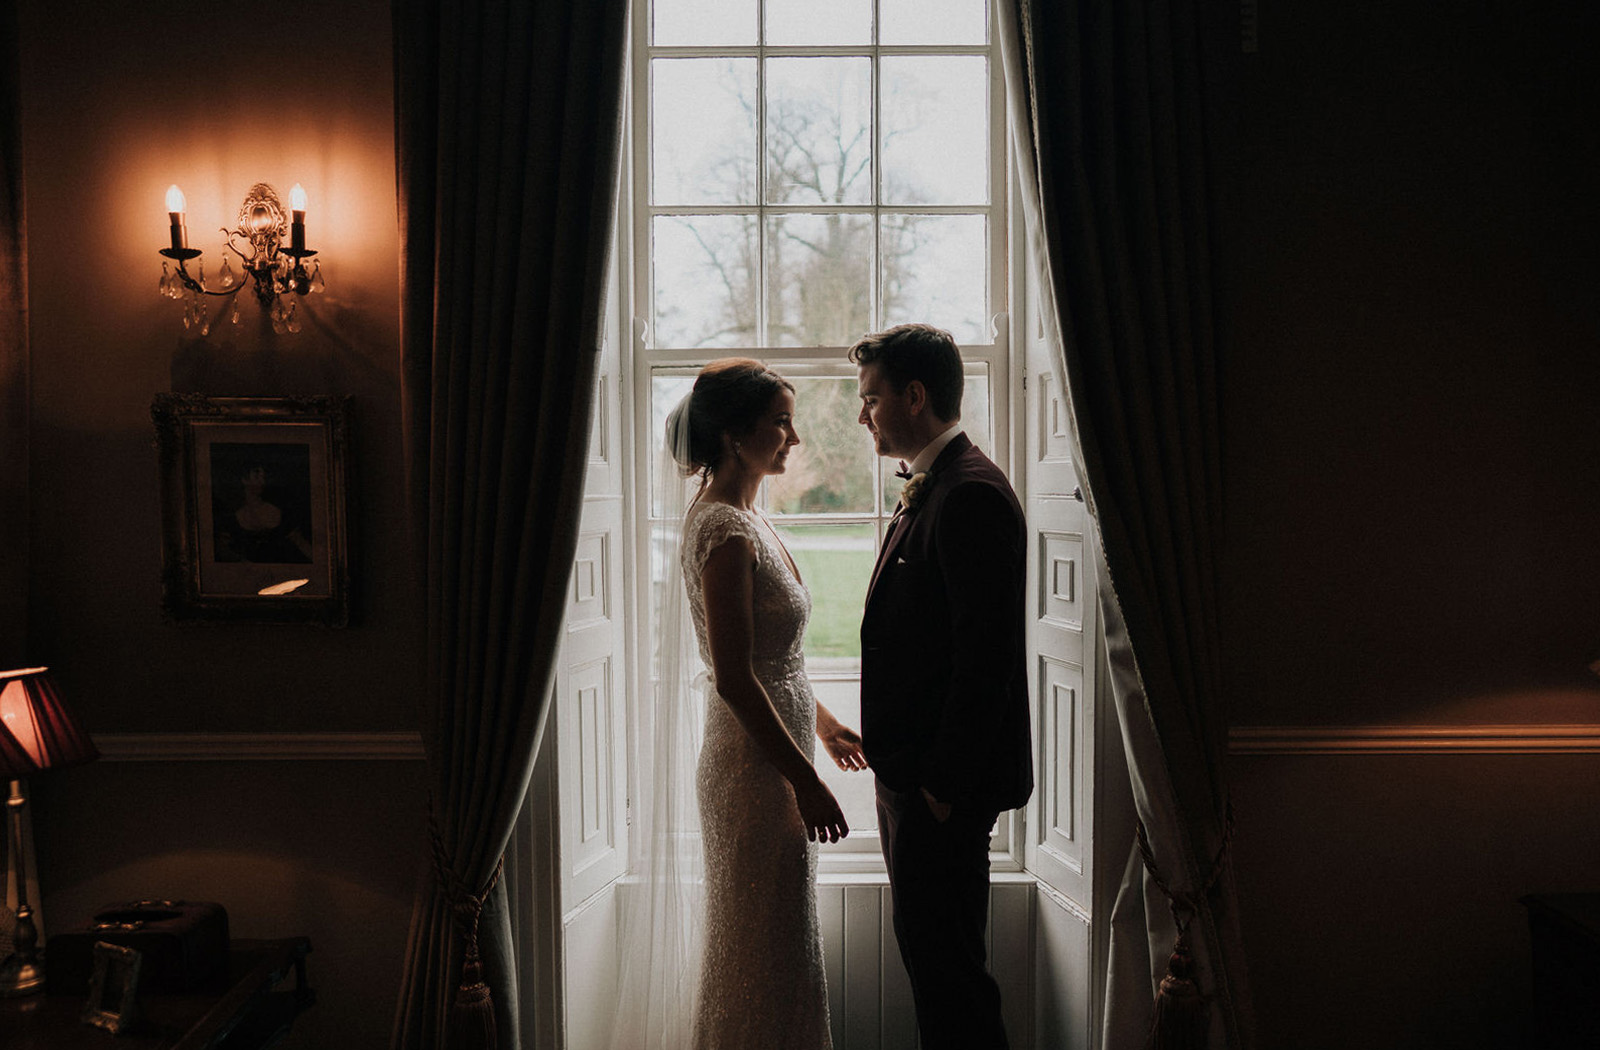 Window portrait at Bellingham castle - Ireland 1